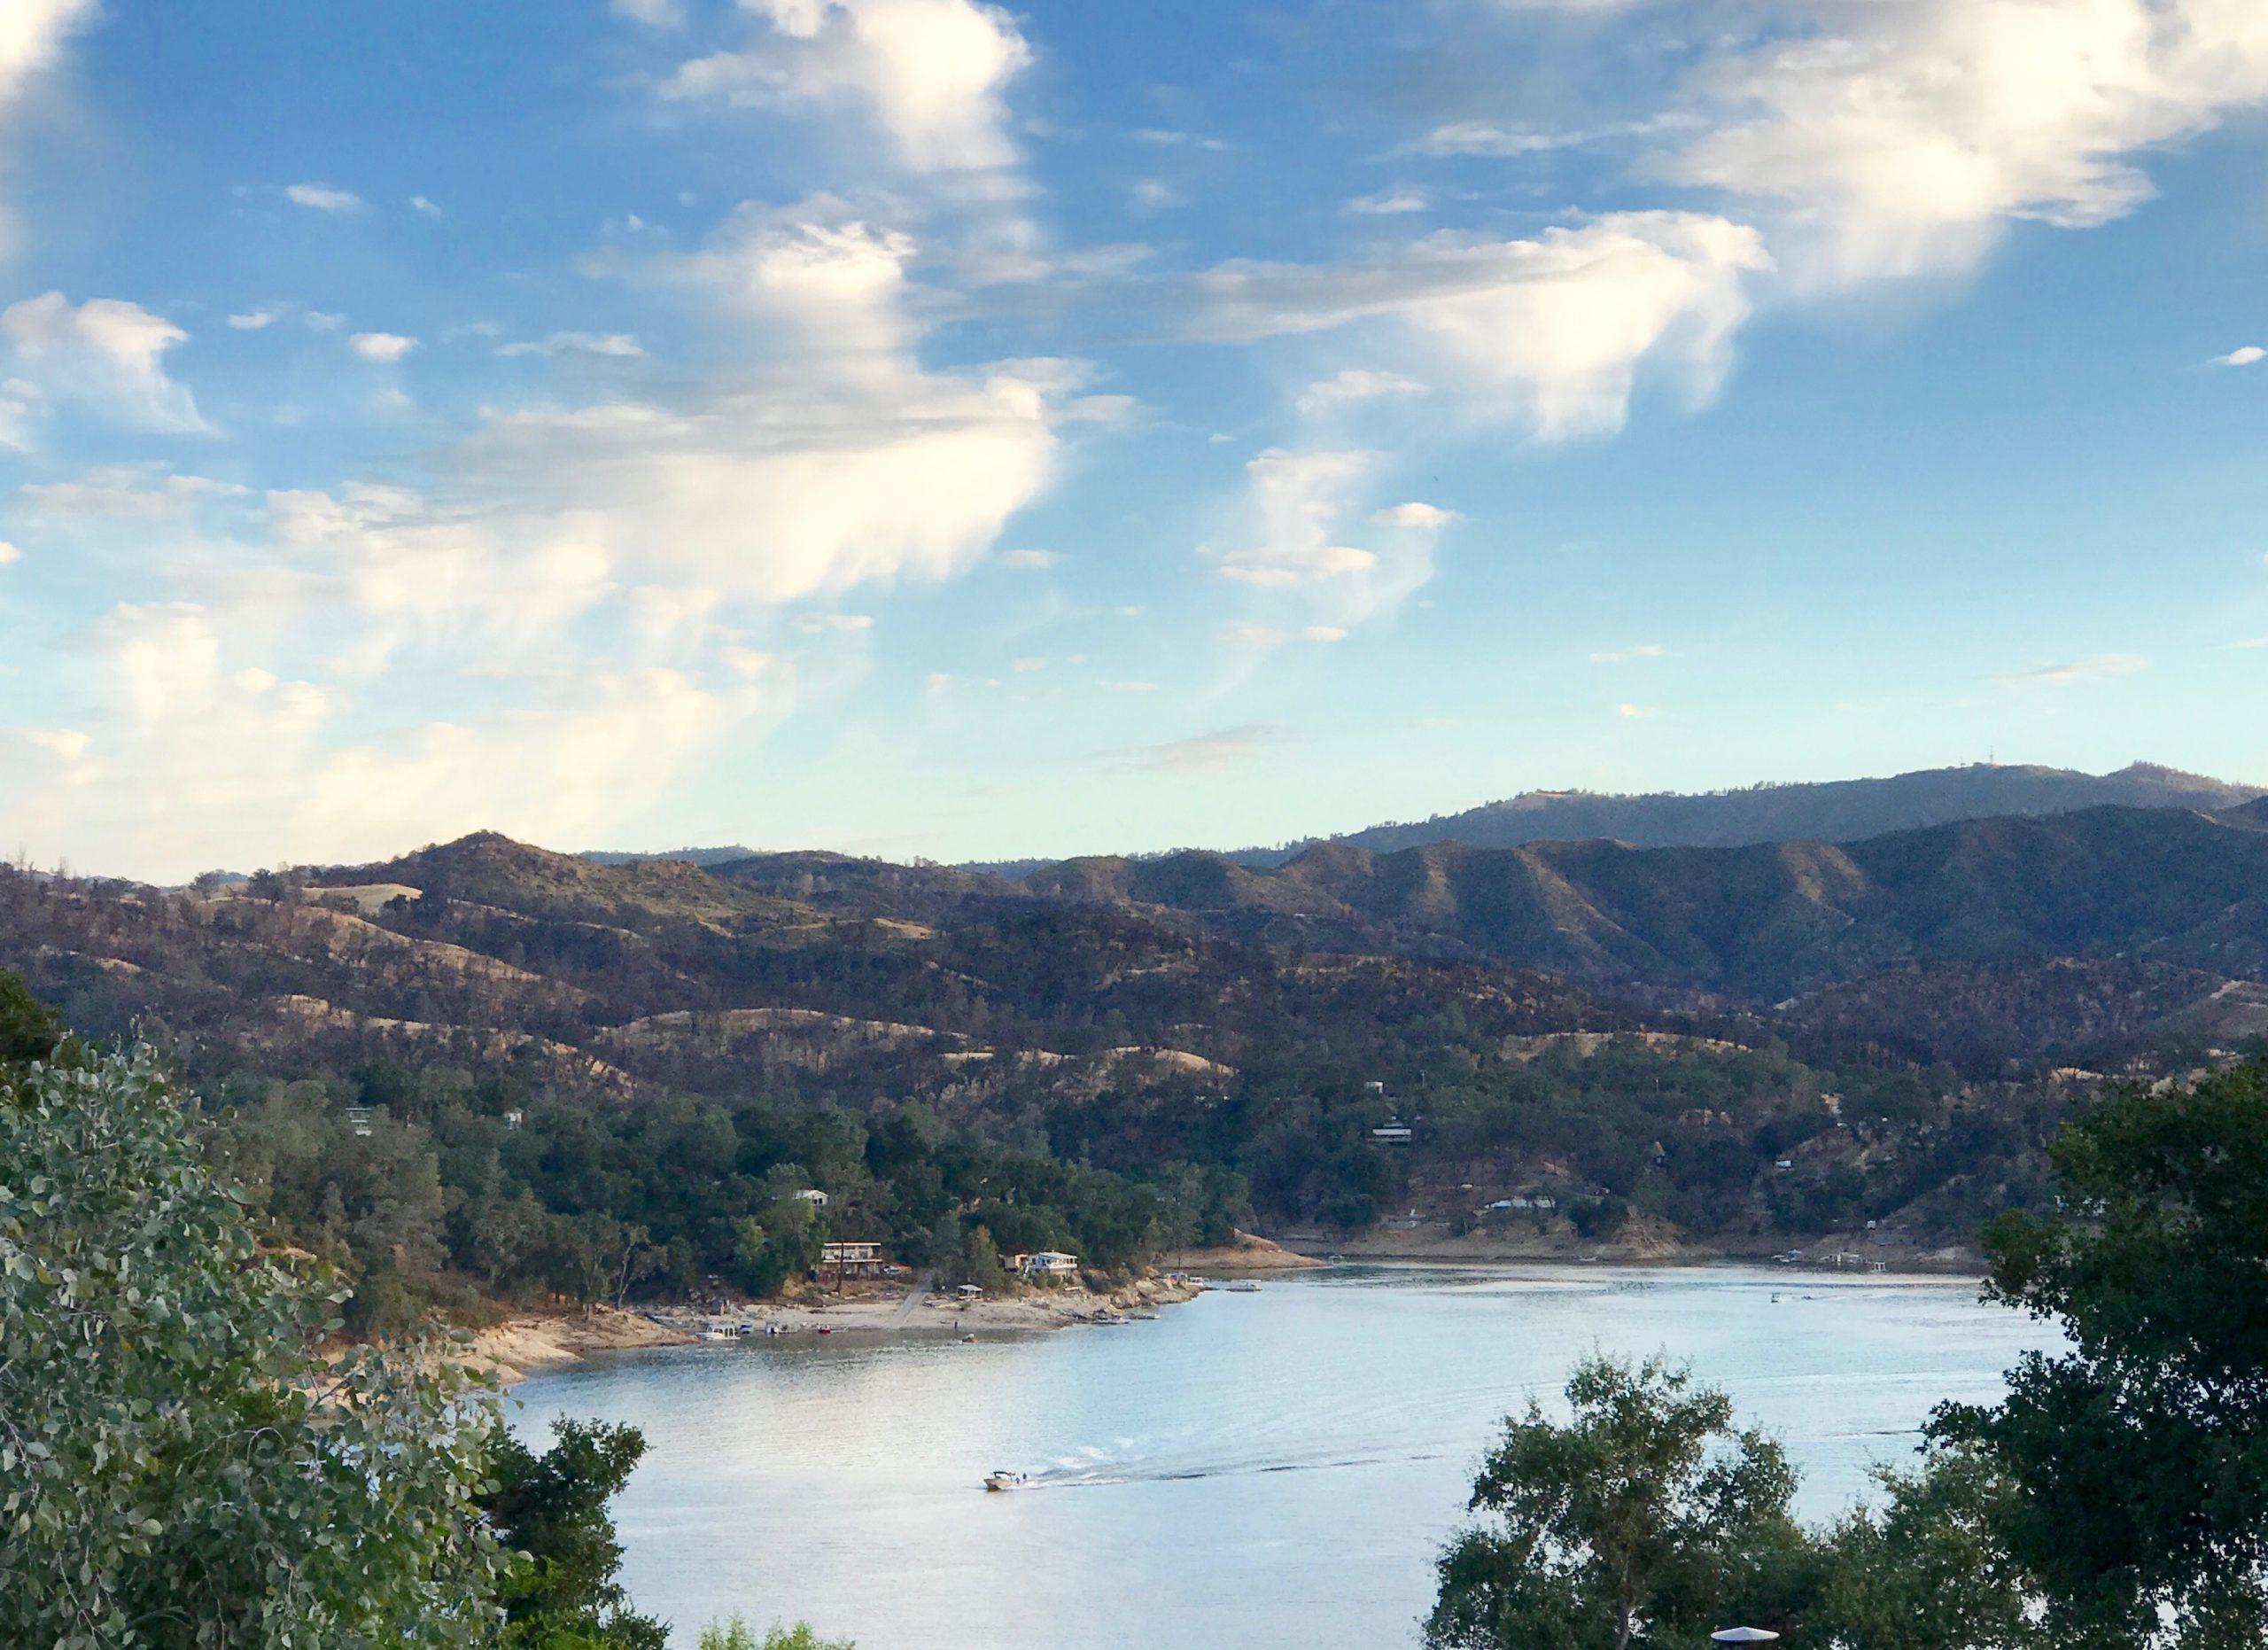 View of Lake Nacimiento near Paso Robles, CA